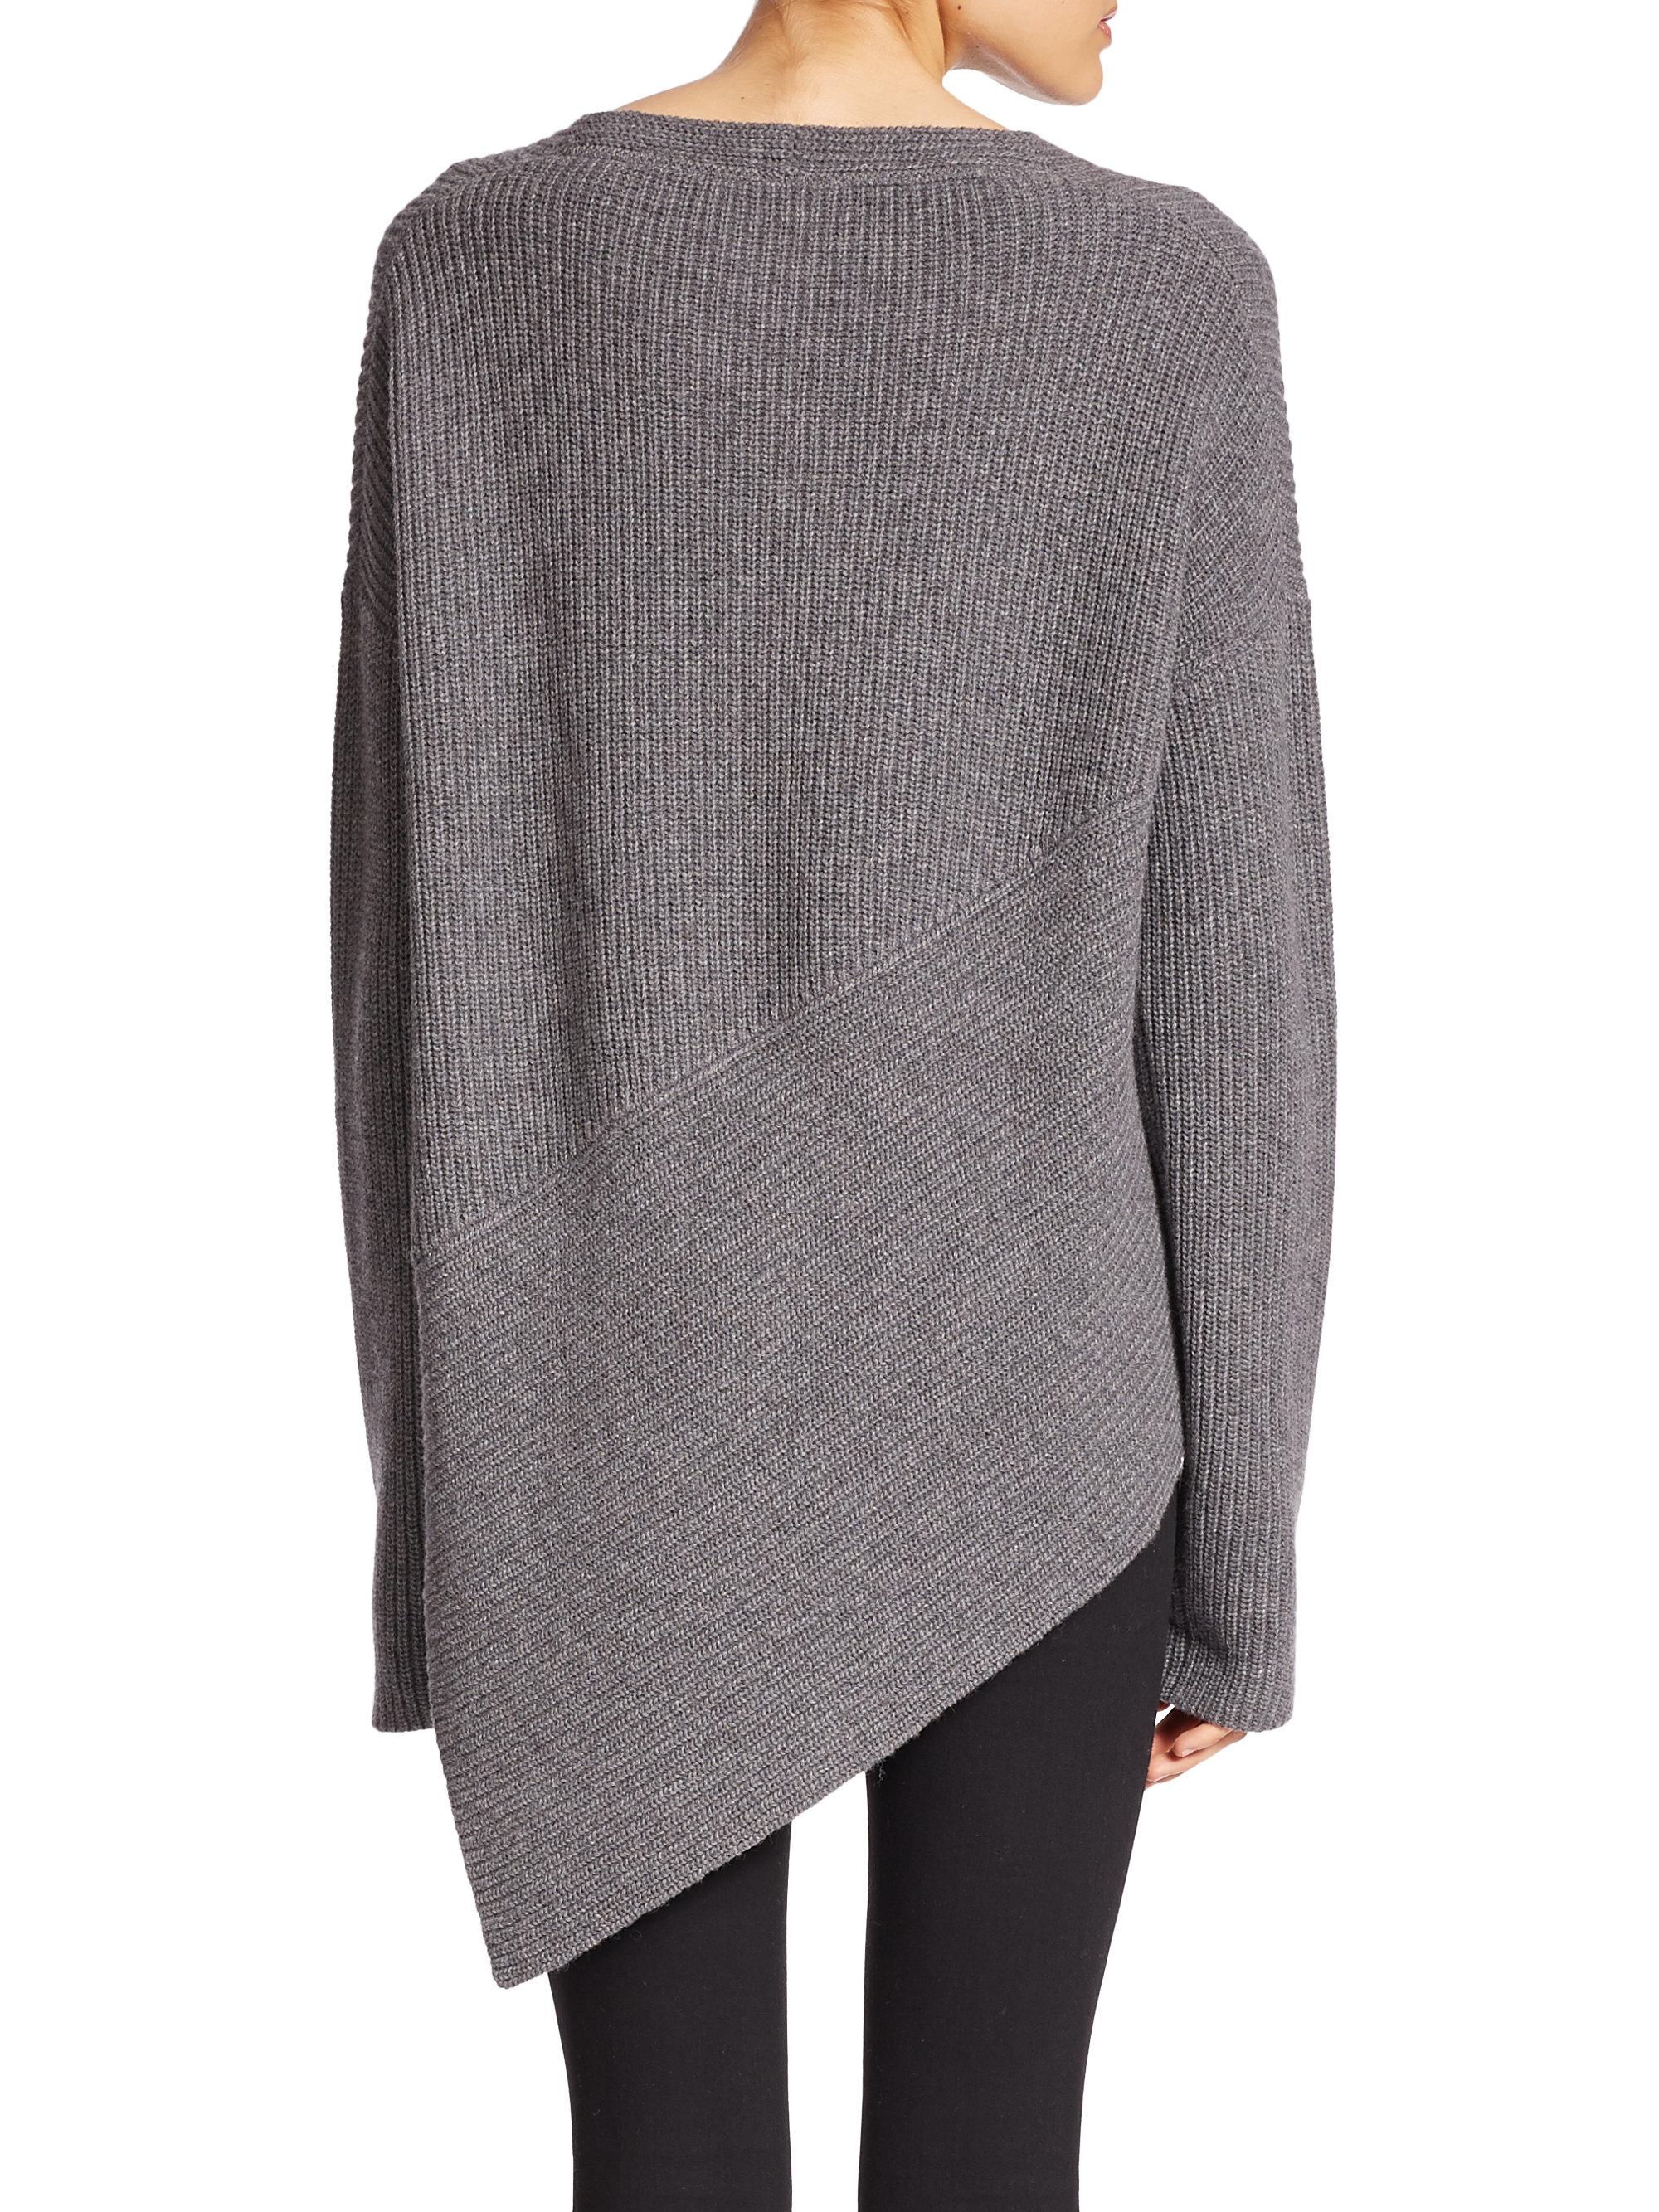 f6c6a4a651f Brochu Walker Thandee Ribbed Asymmetrical Sweater in Gray - Lyst